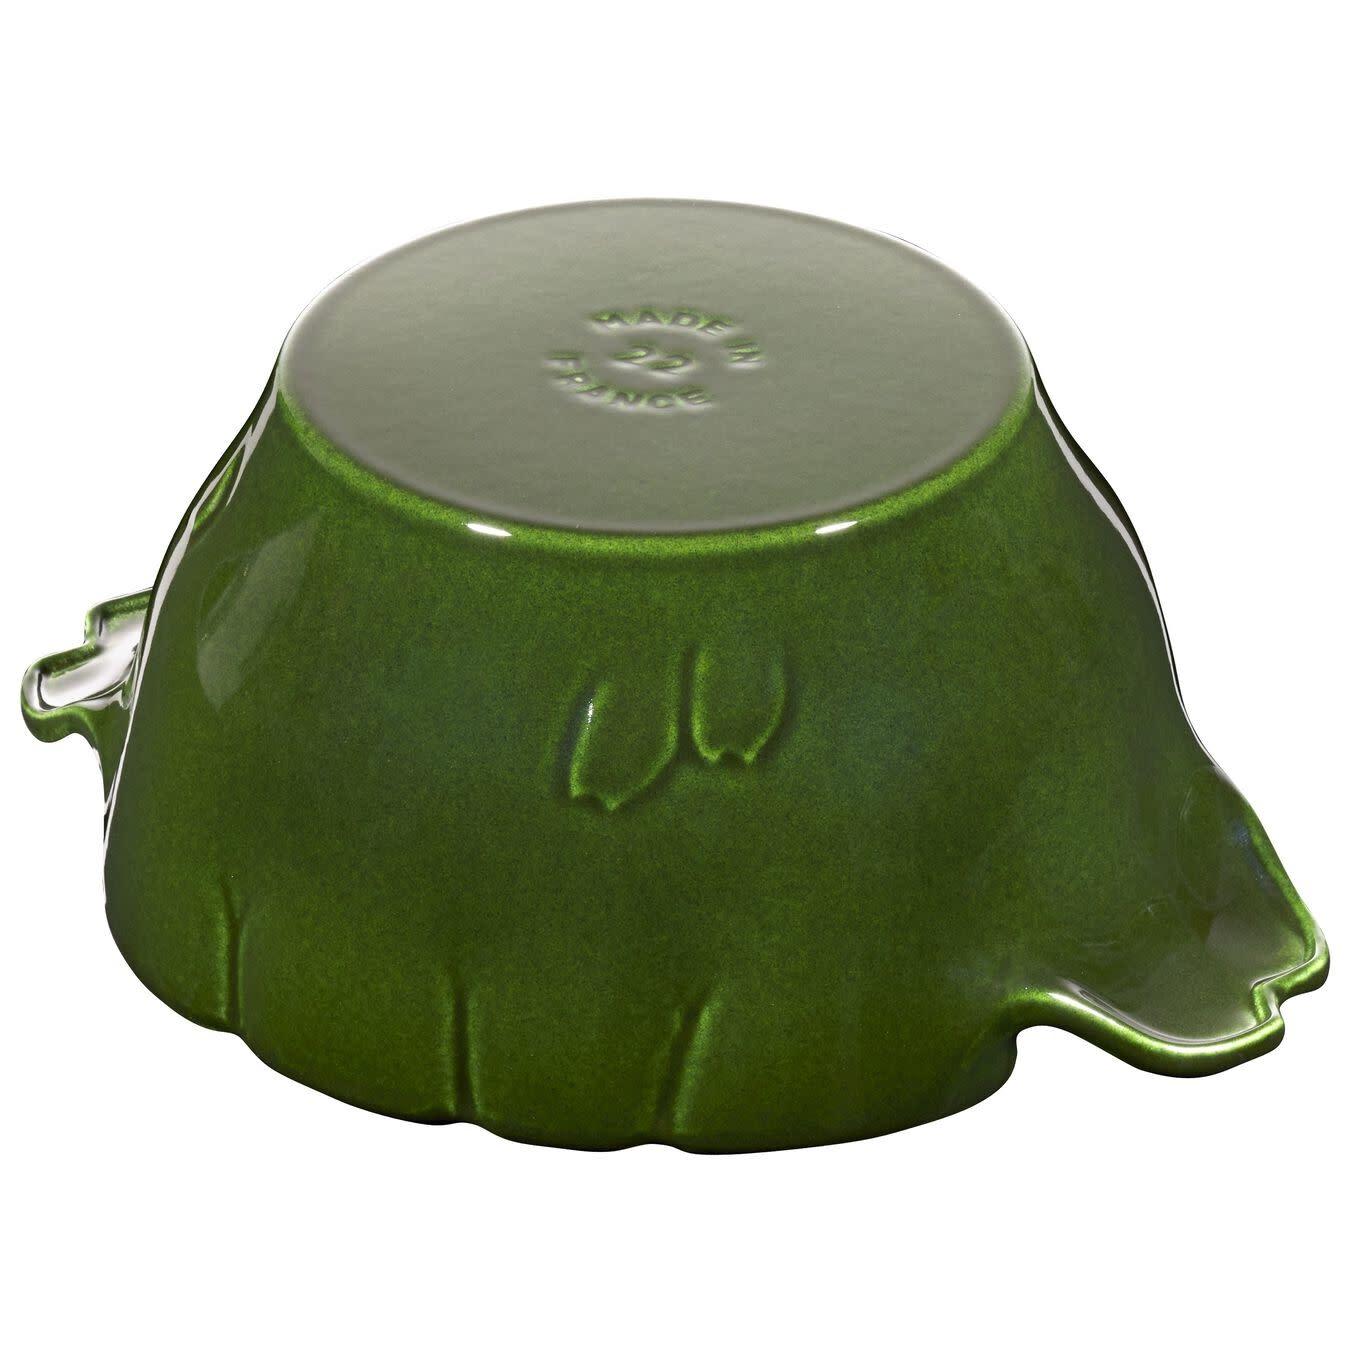 Staub Cocotte 3qt/3L Artichoke - Basil Green